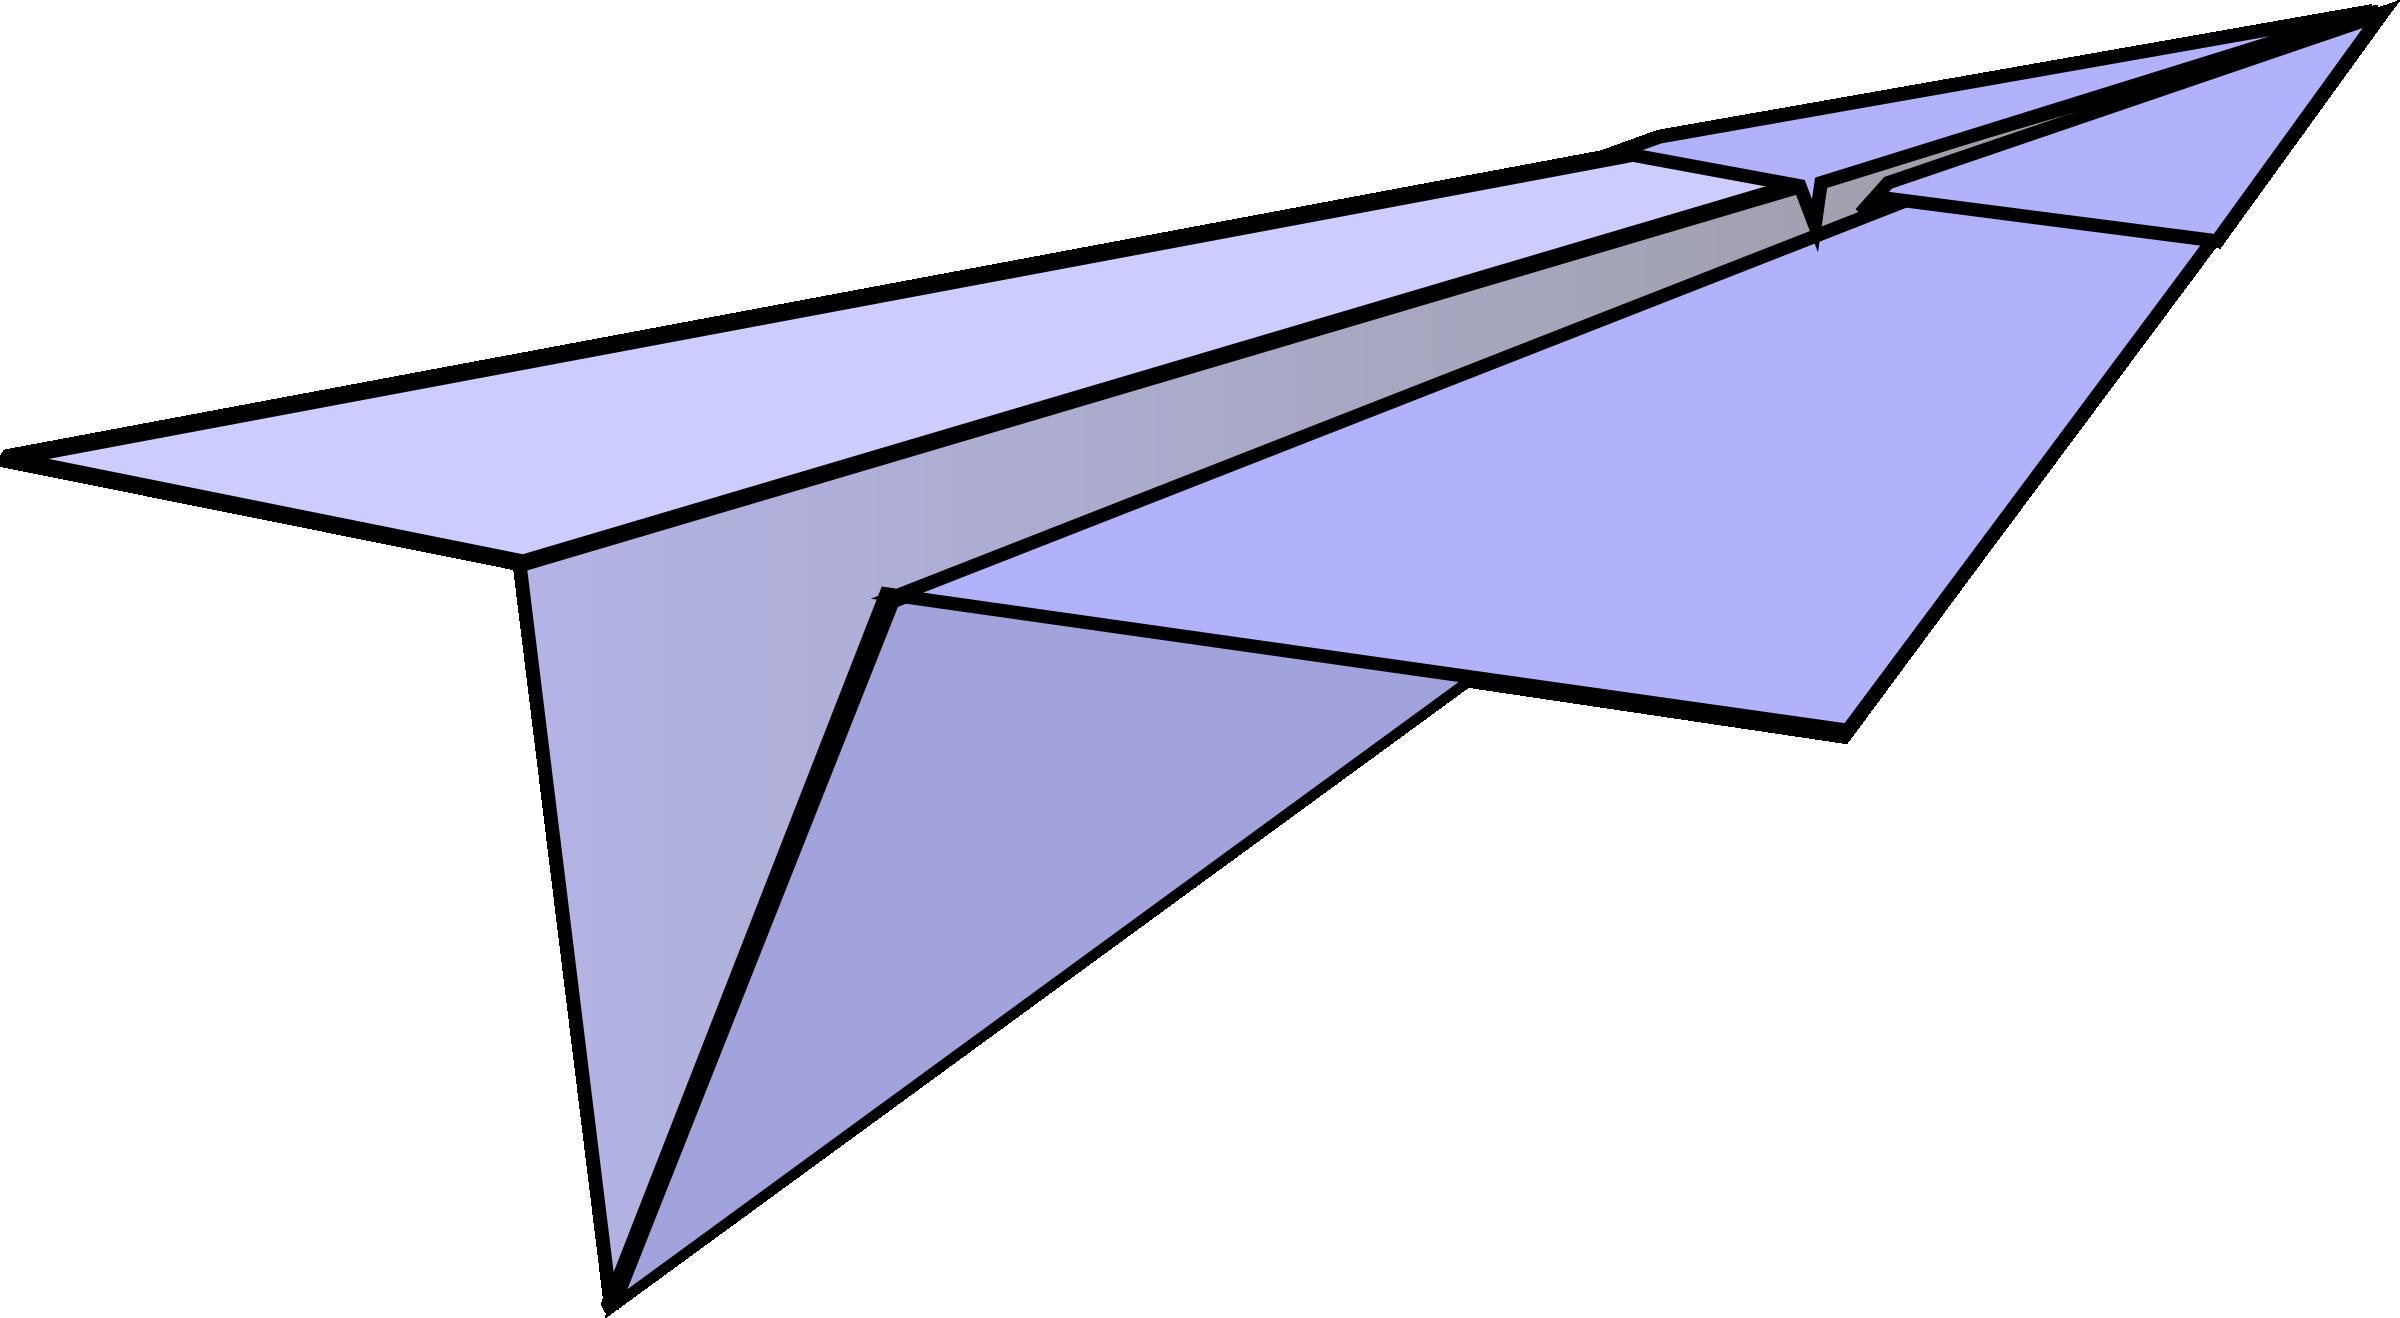 Paper airplane clipart with color - ClipartFest clipart transparent